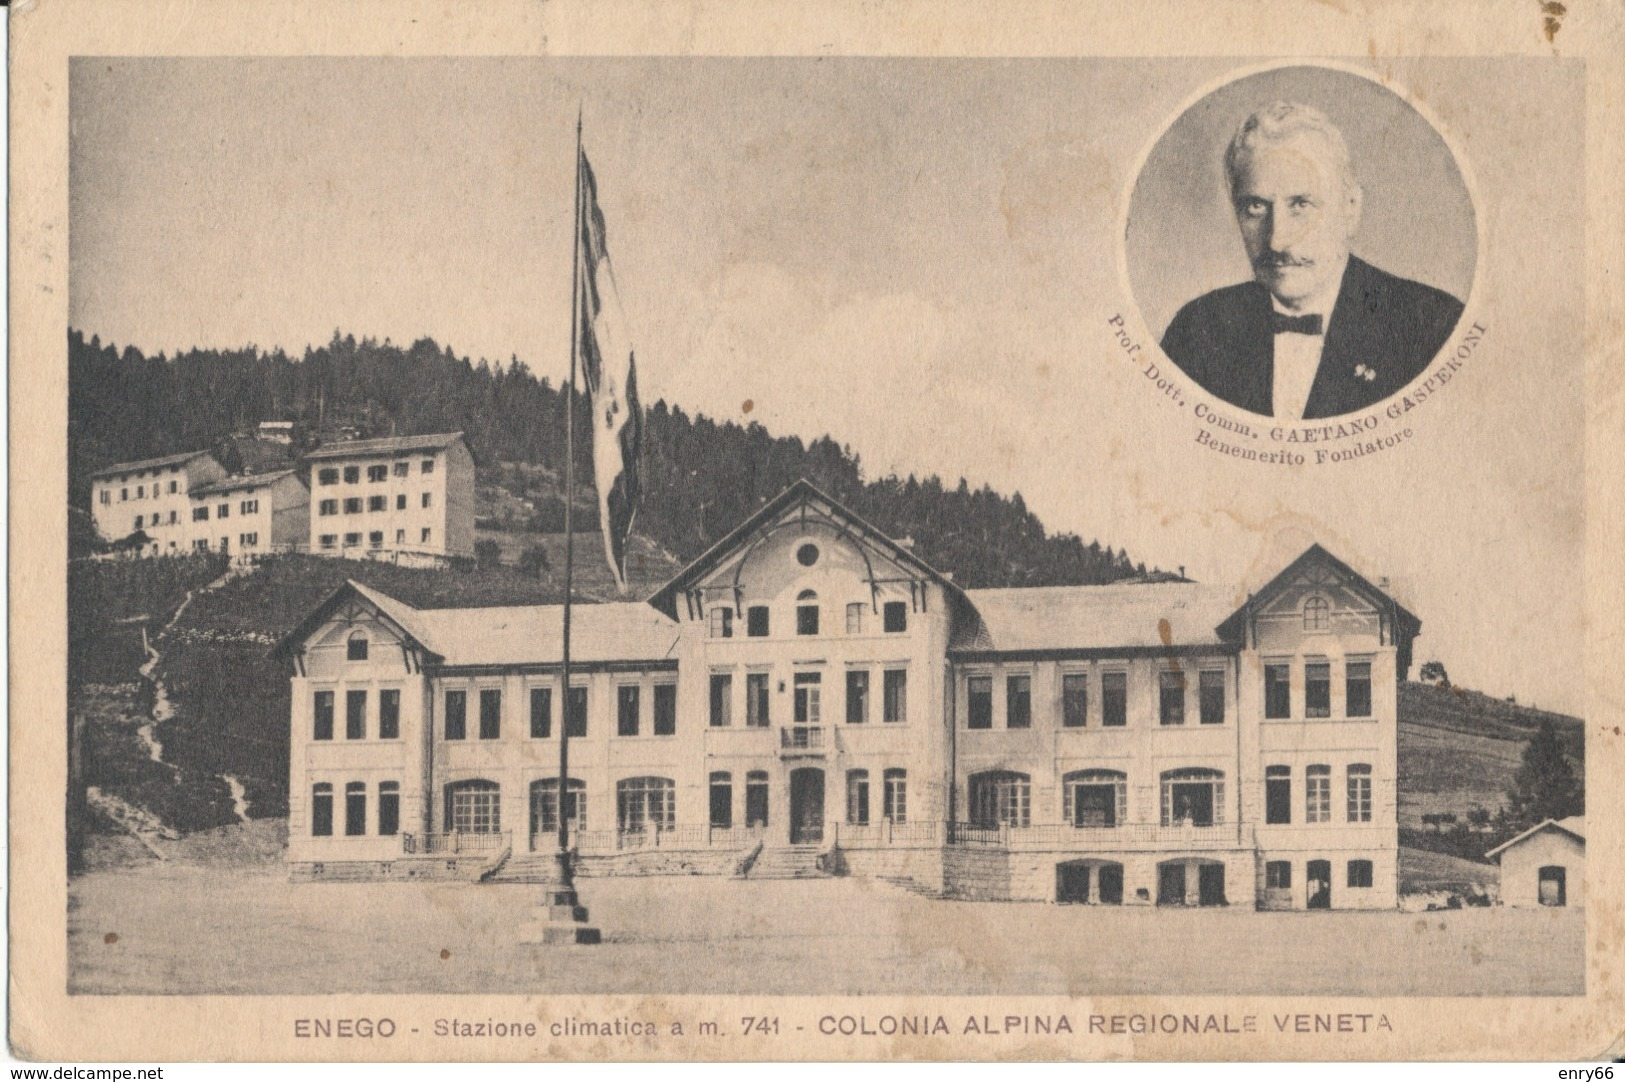 VICENZA-ENEGO STAZIONE CLIMATICA - Vicenza